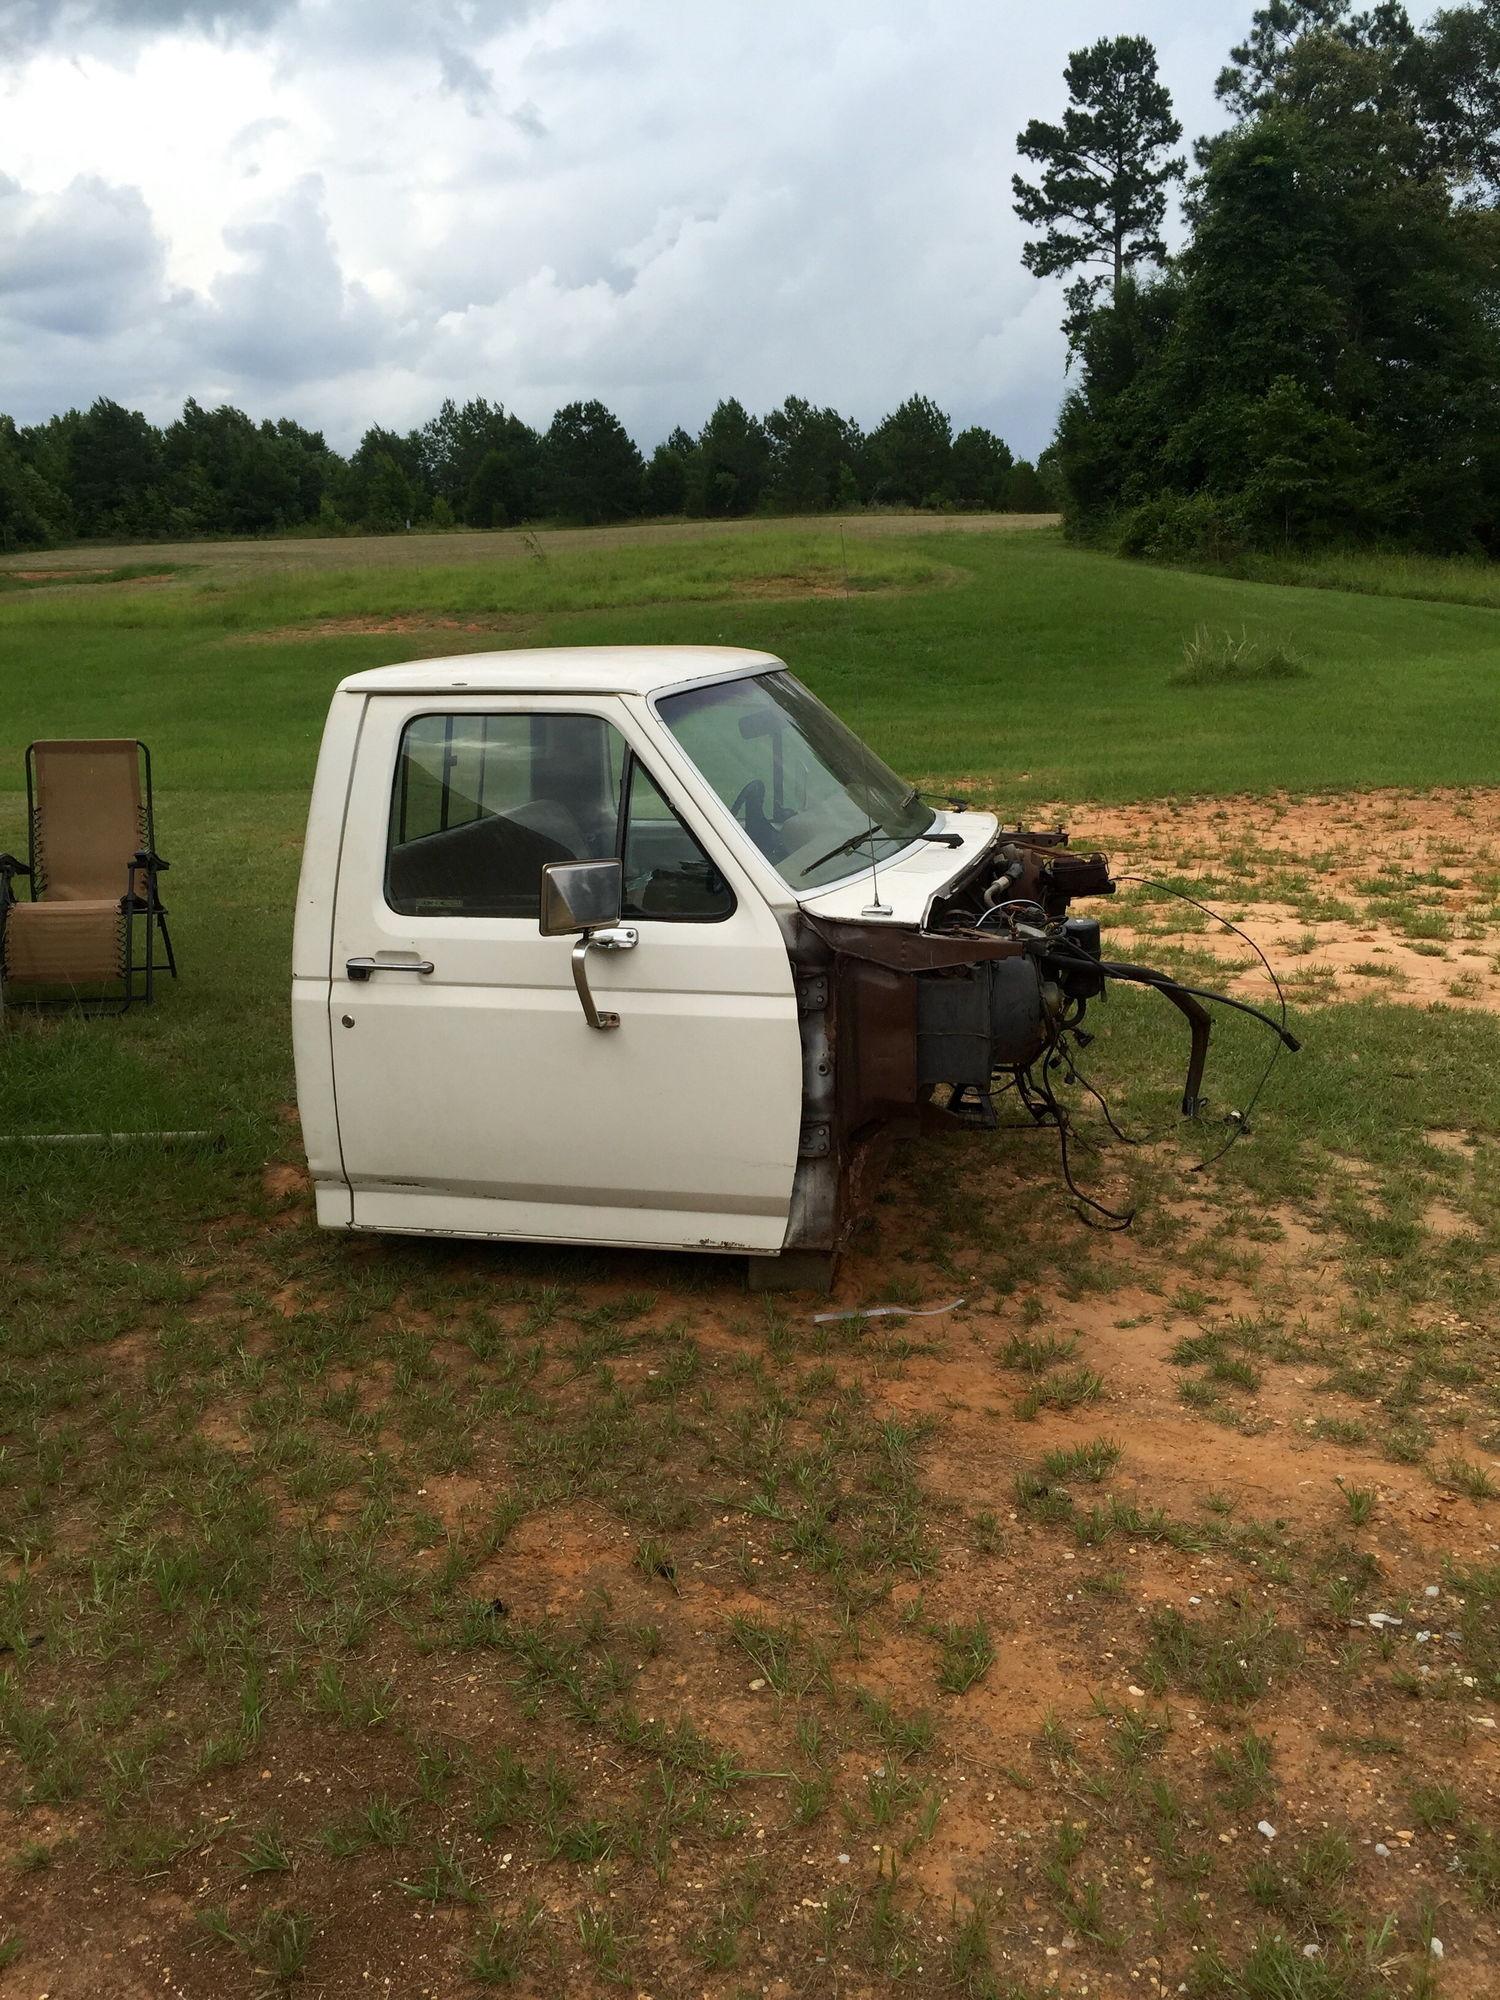 1983 f100 flare side 5 0 coyote swap ford truck. Black Bedroom Furniture Sets. Home Design Ideas